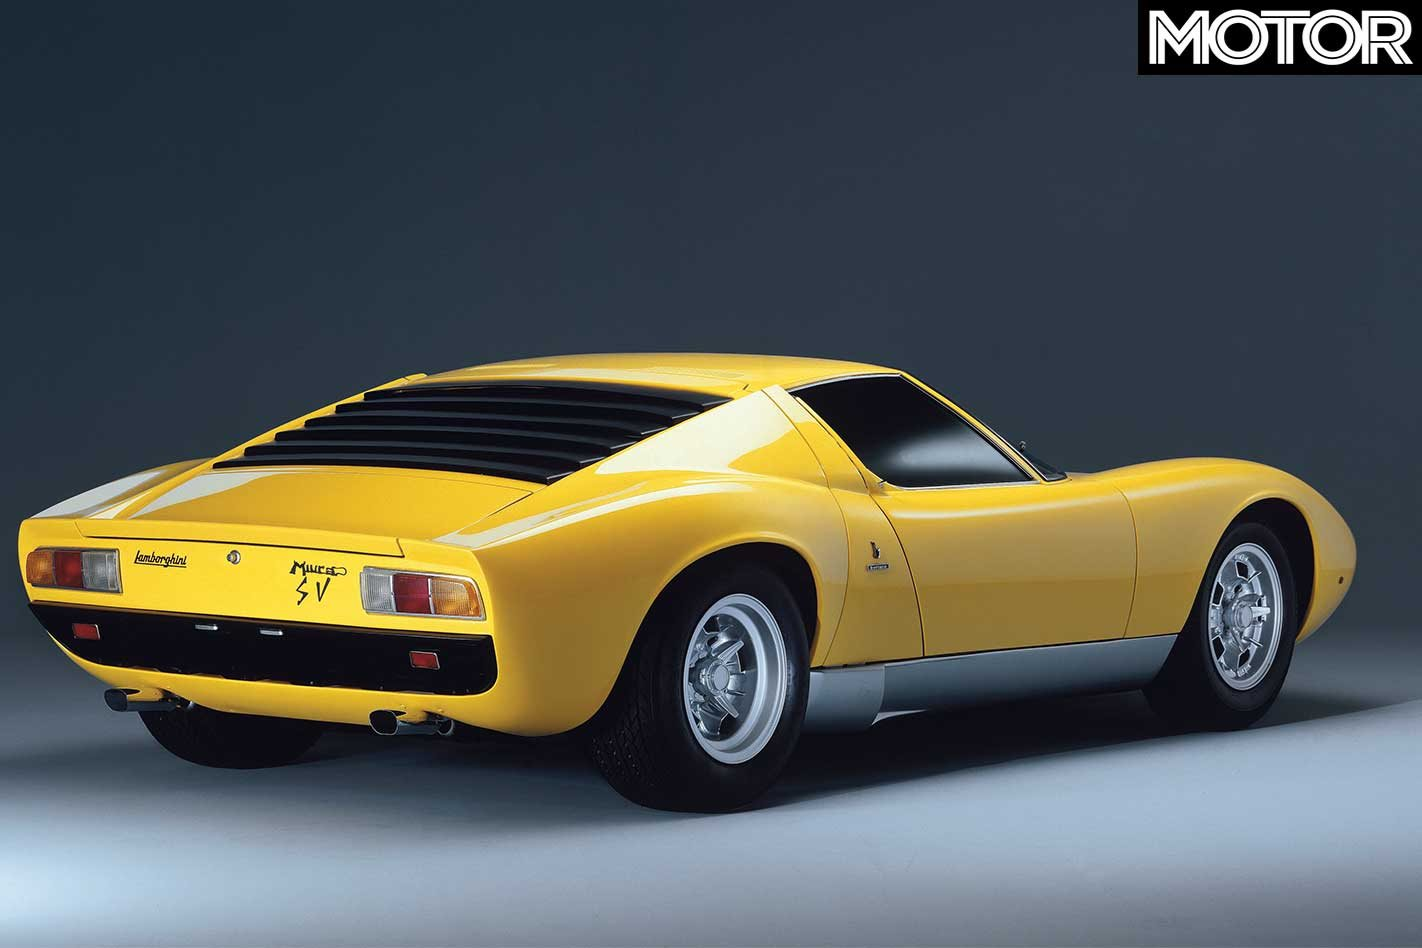 1971 Lamborghini Miura Sv Feature Motor